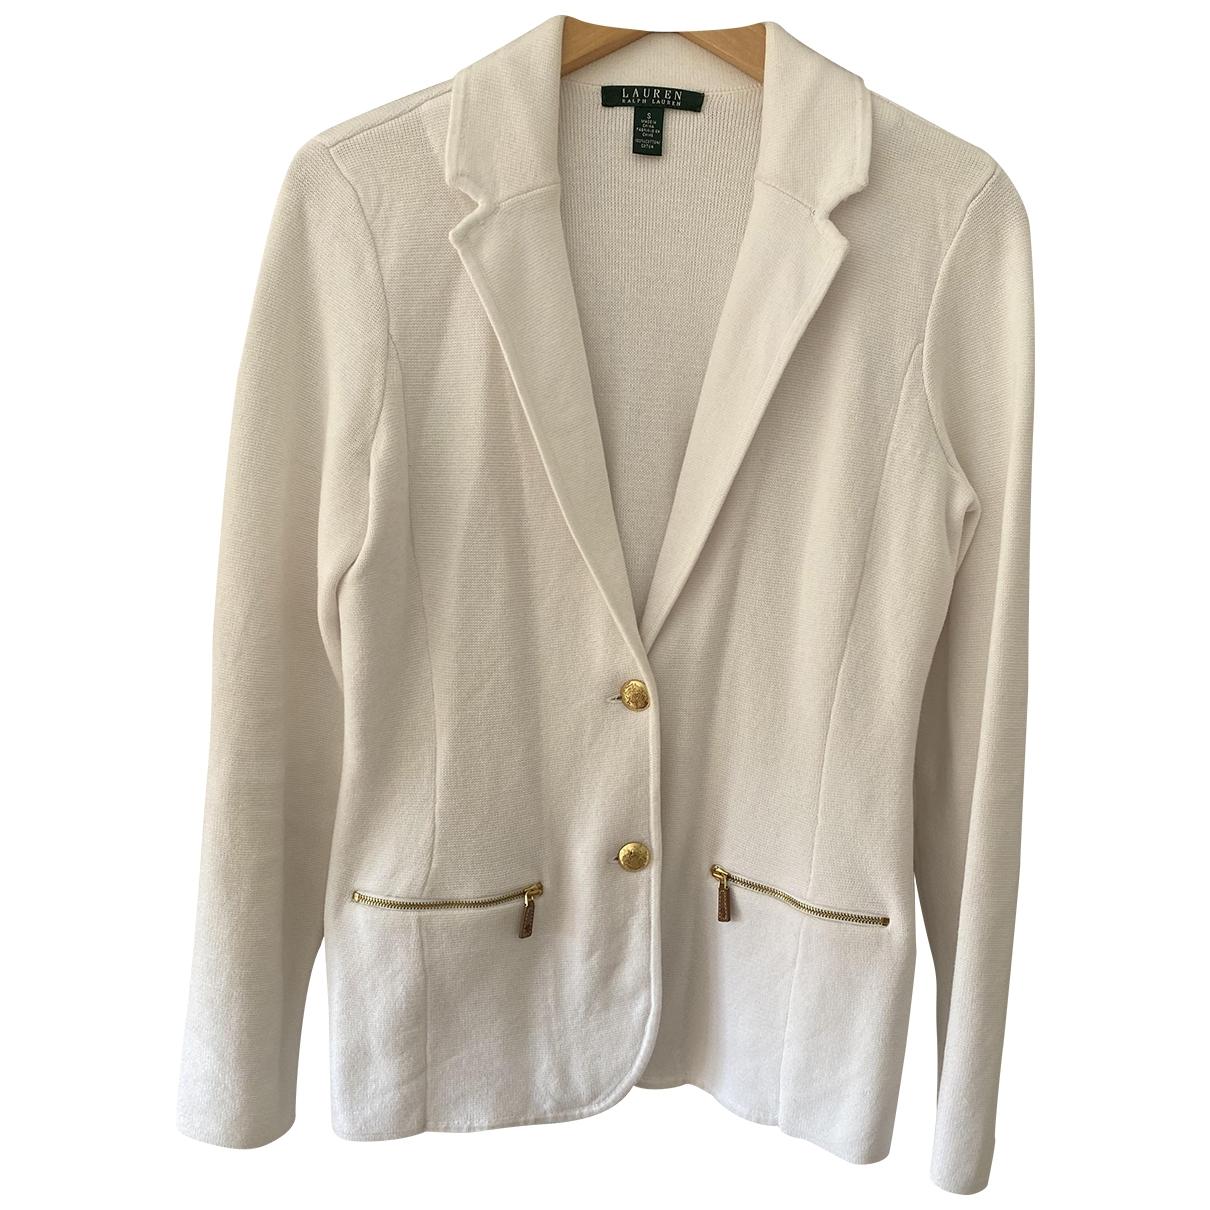 Lauren Ralph Lauren \N White Cotton jacket for Women S International